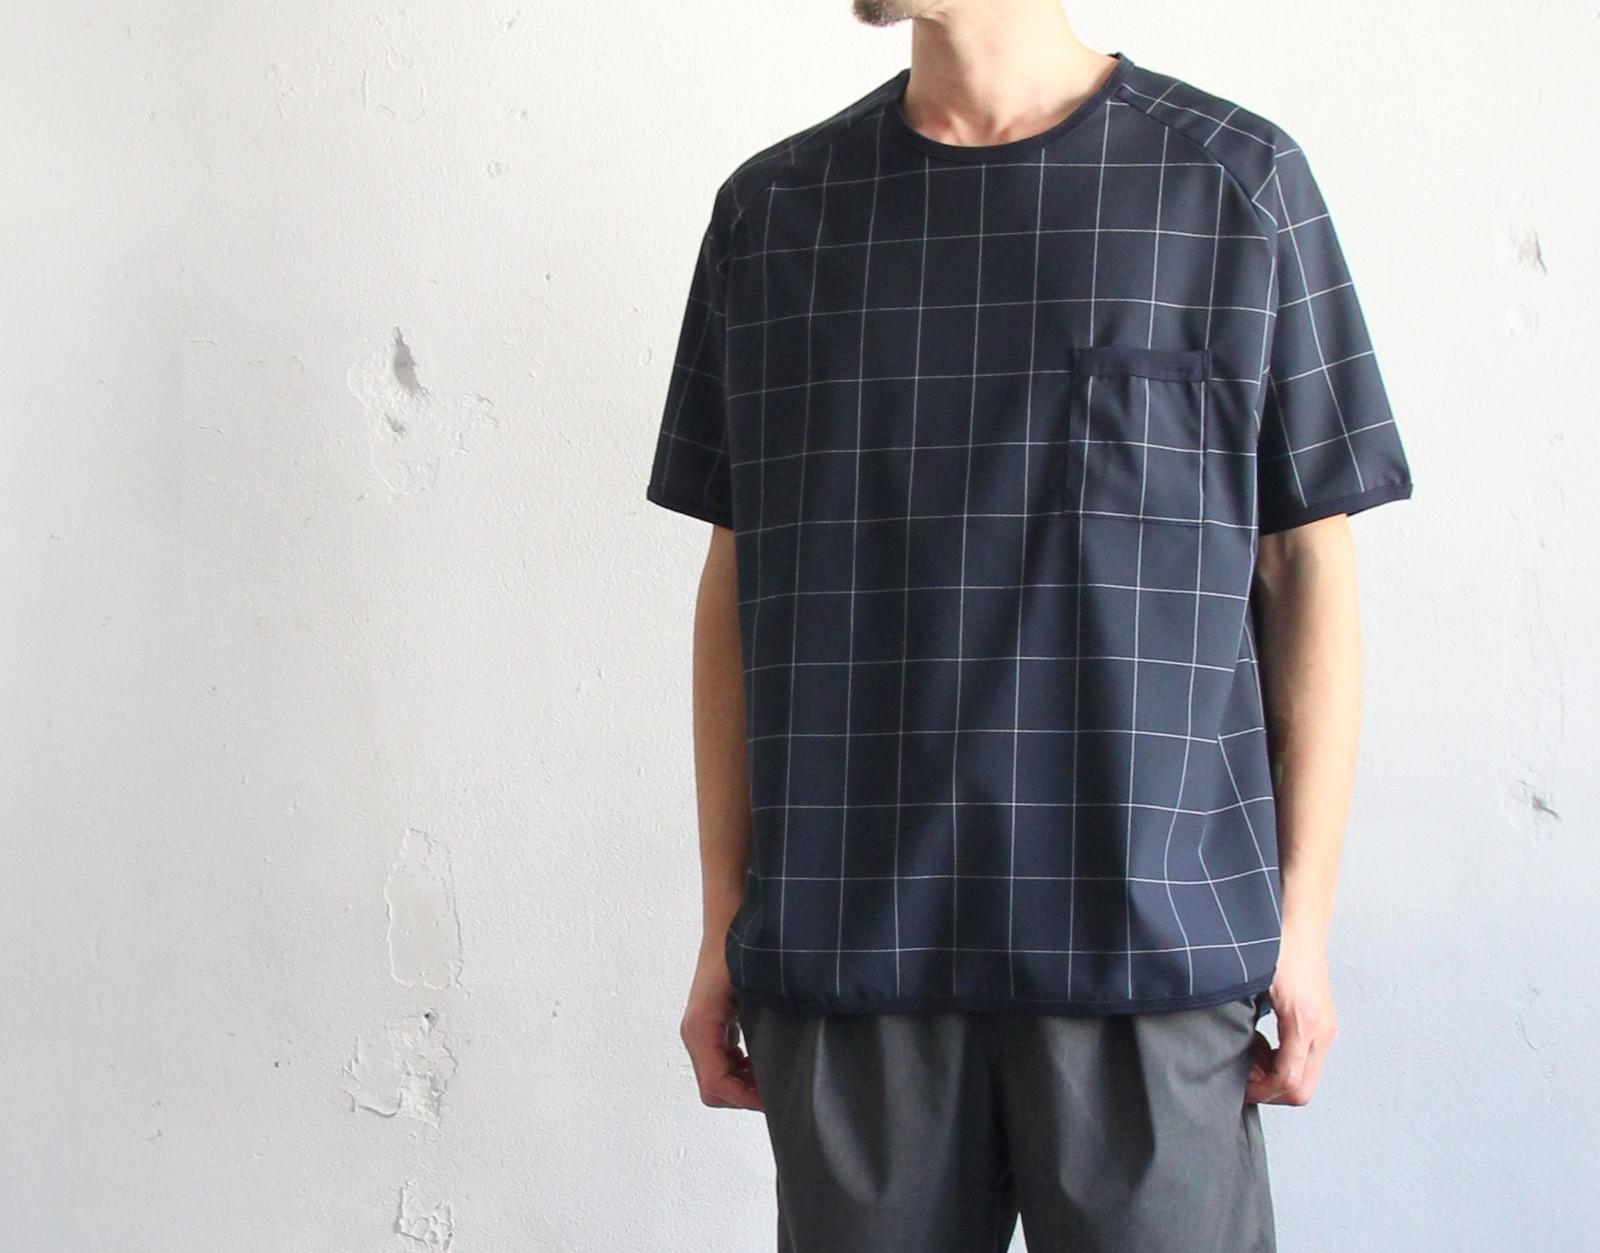 Tro Cool T-shirt_c0379477_20182844.jpg